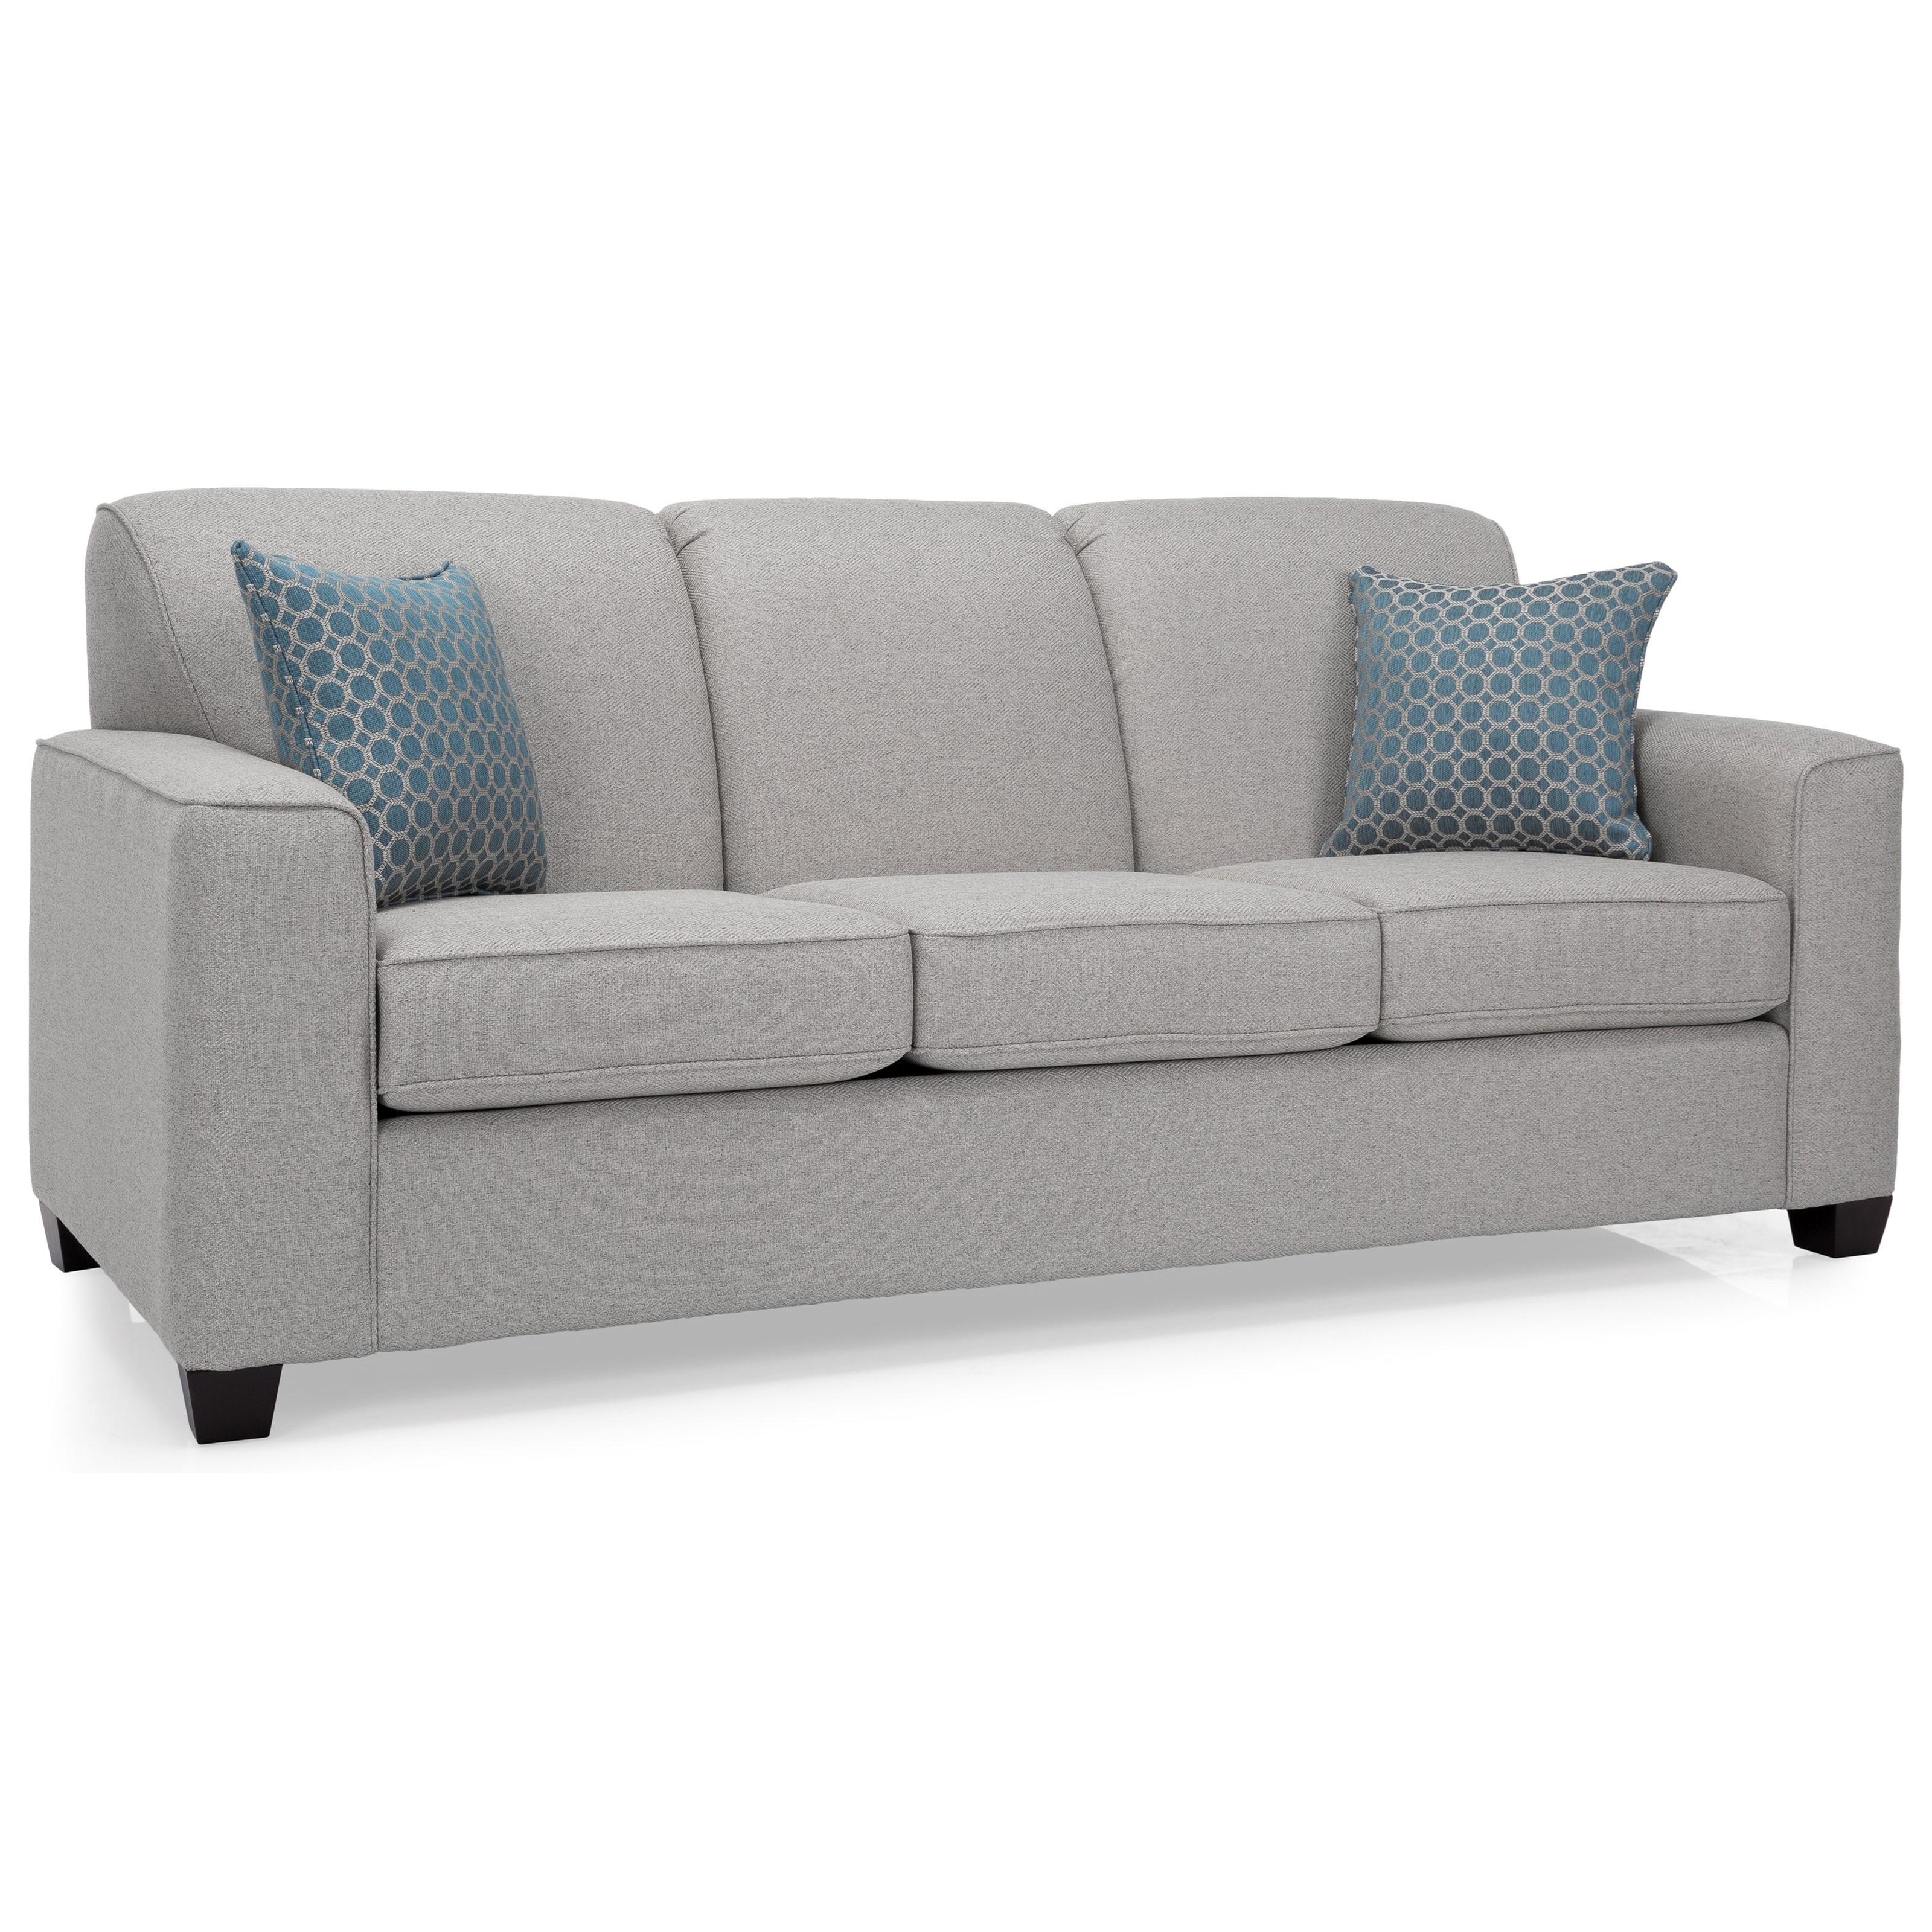 2705 Sofa Sleeper by Decor-Rest at Stoney Creek Furniture